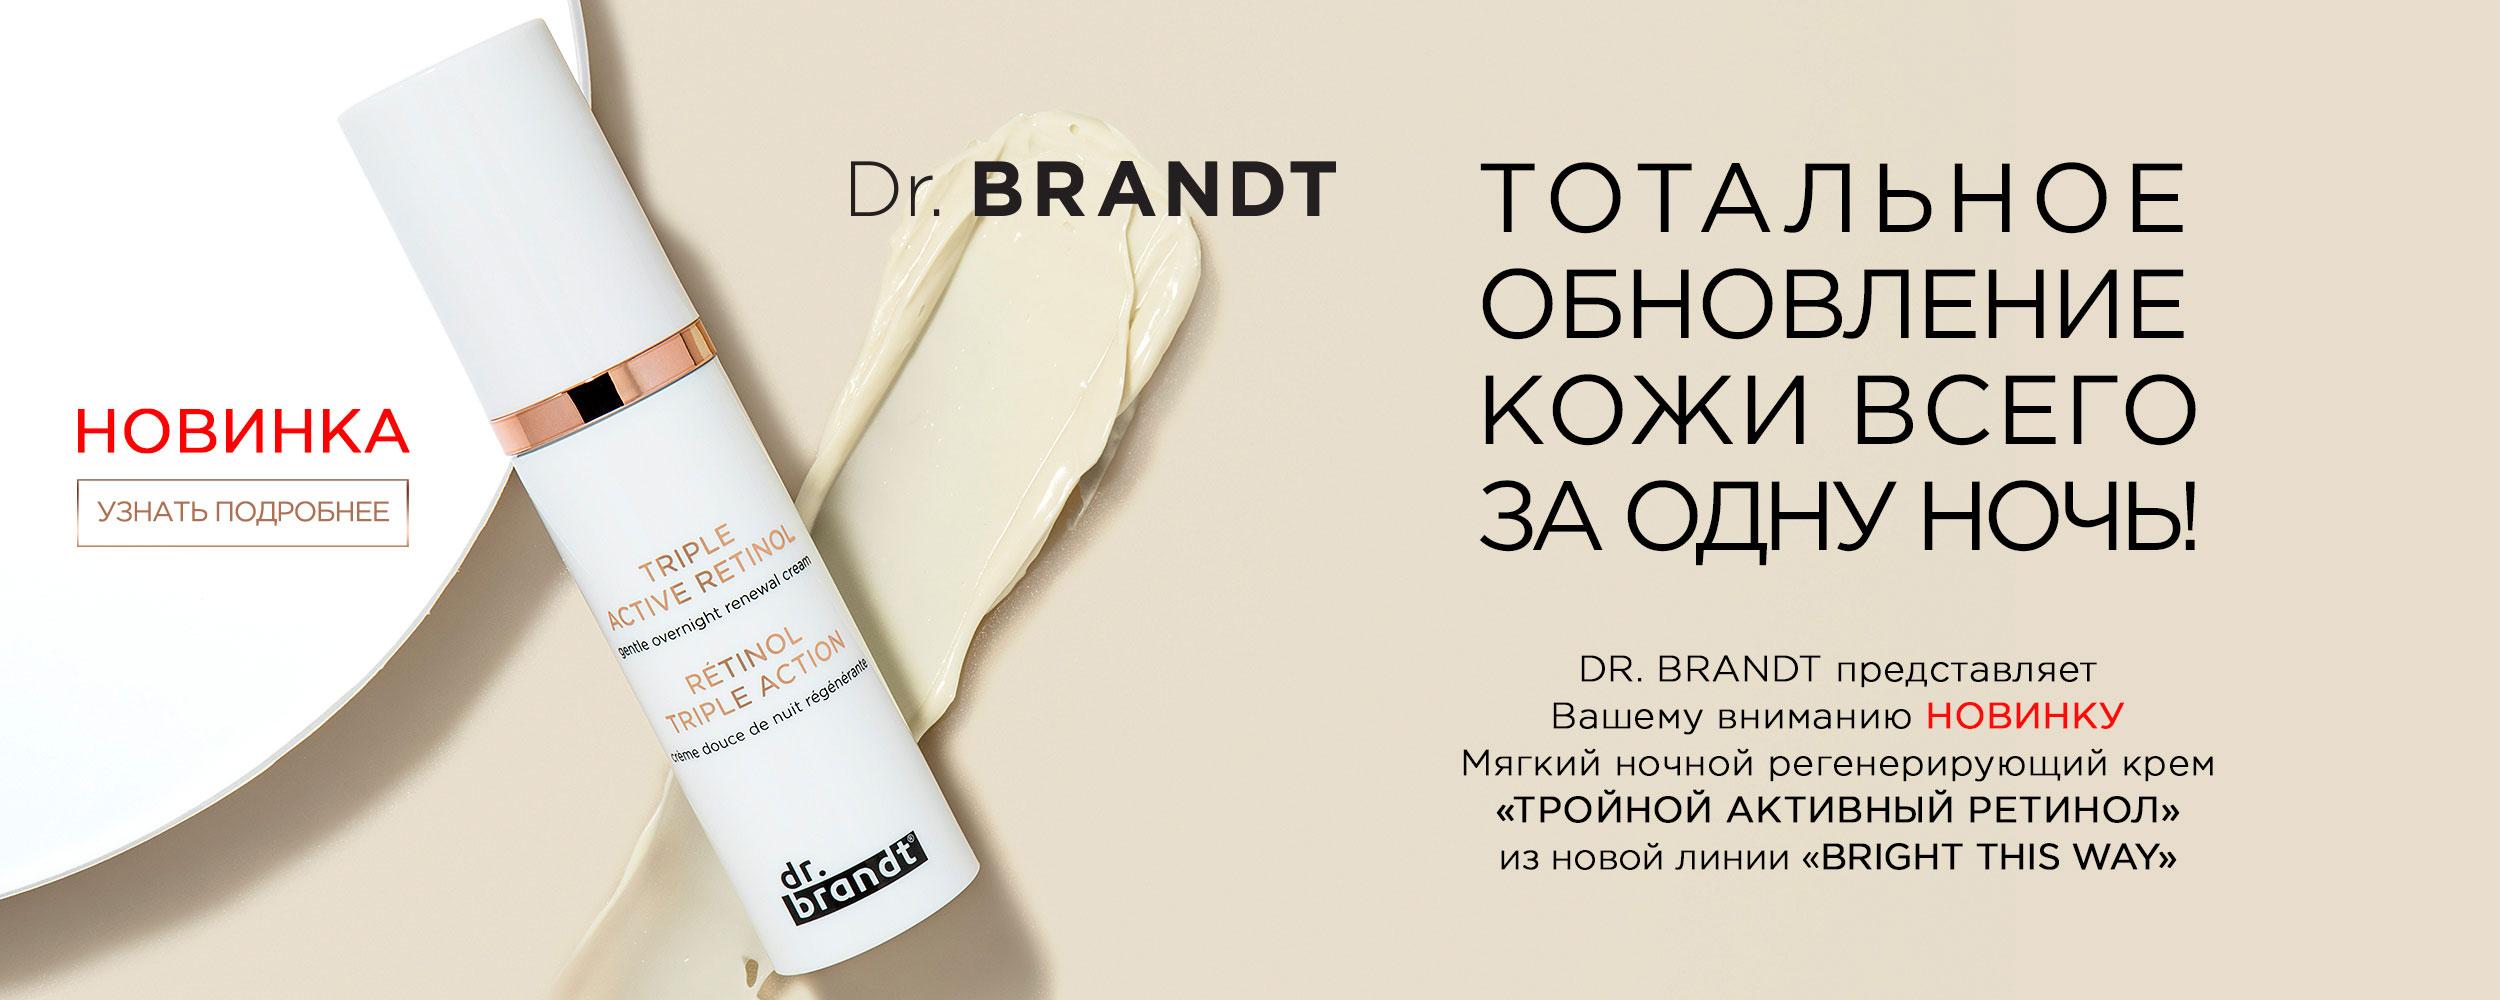 BR-Triple-active-retinol